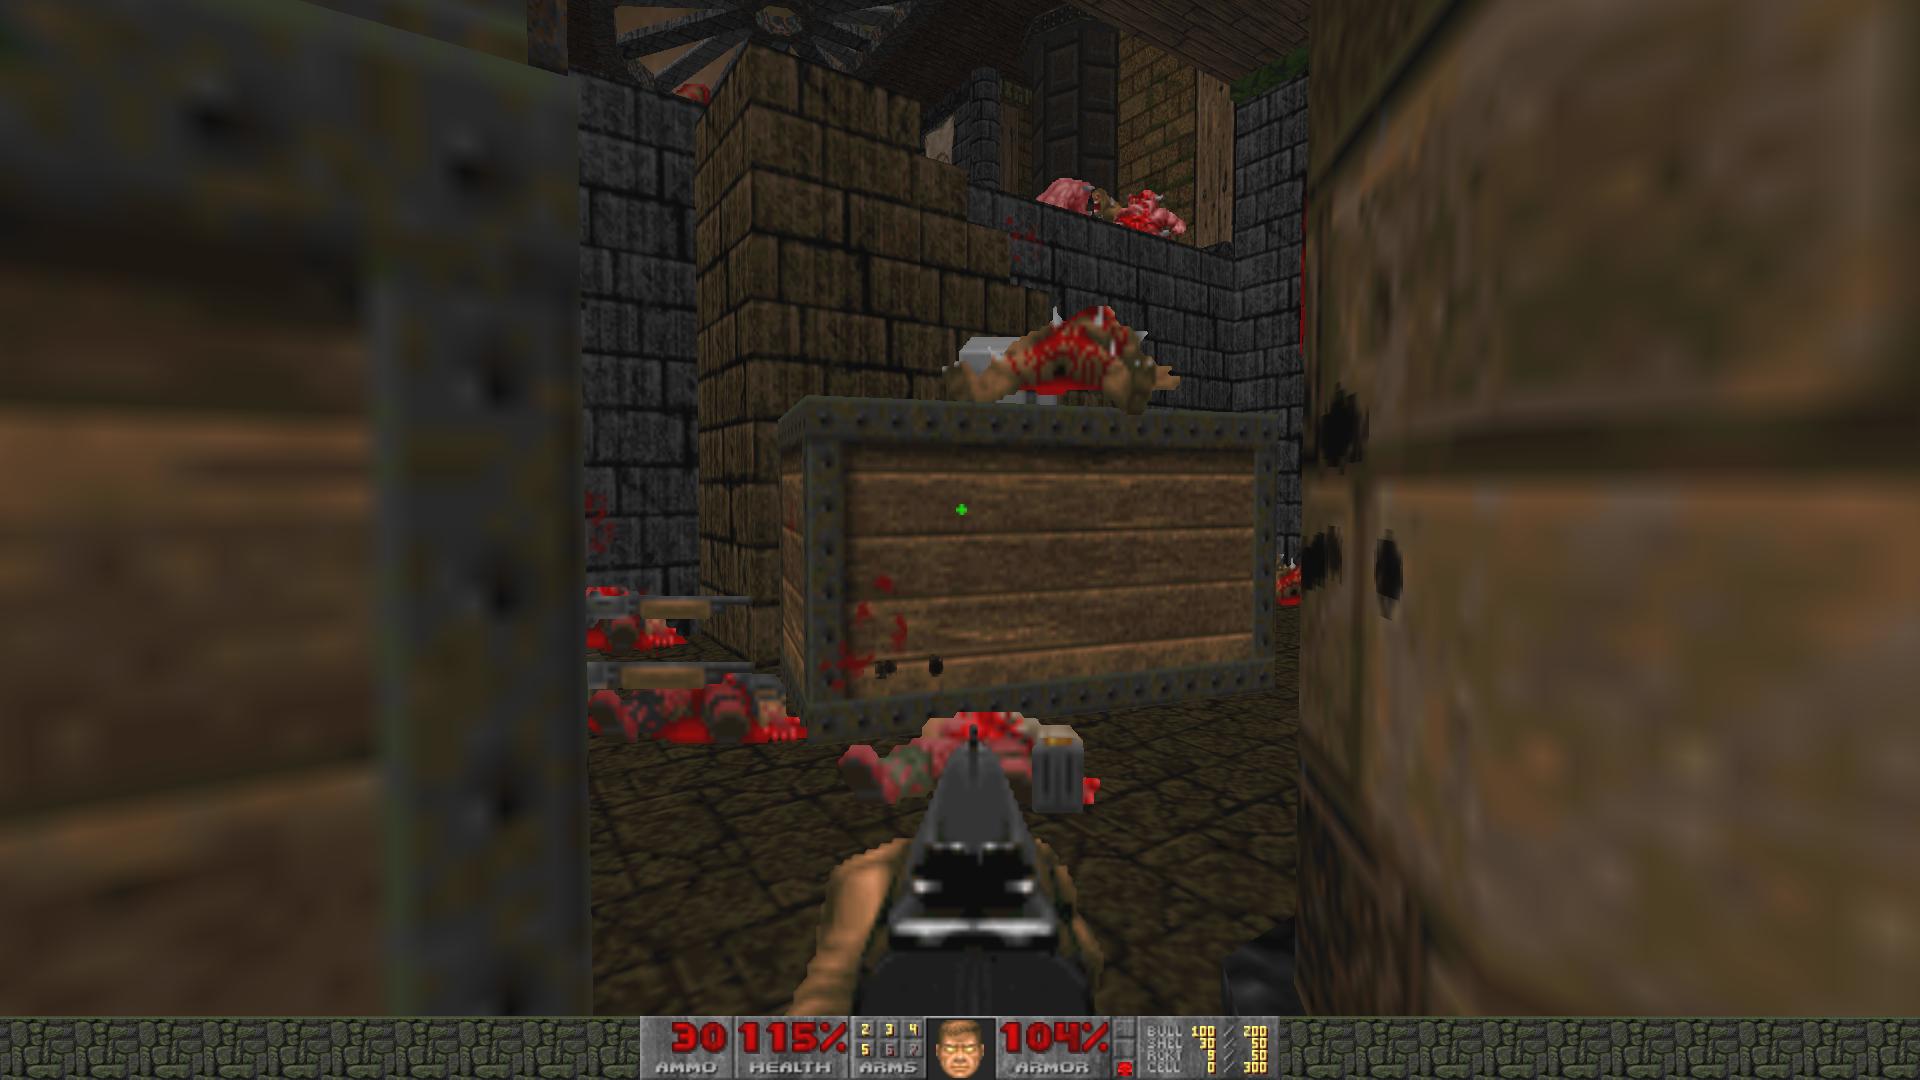 Screenshot_Doom_20190911_084105.png.7030cd4a10cd4411201bd87f551b6696.png